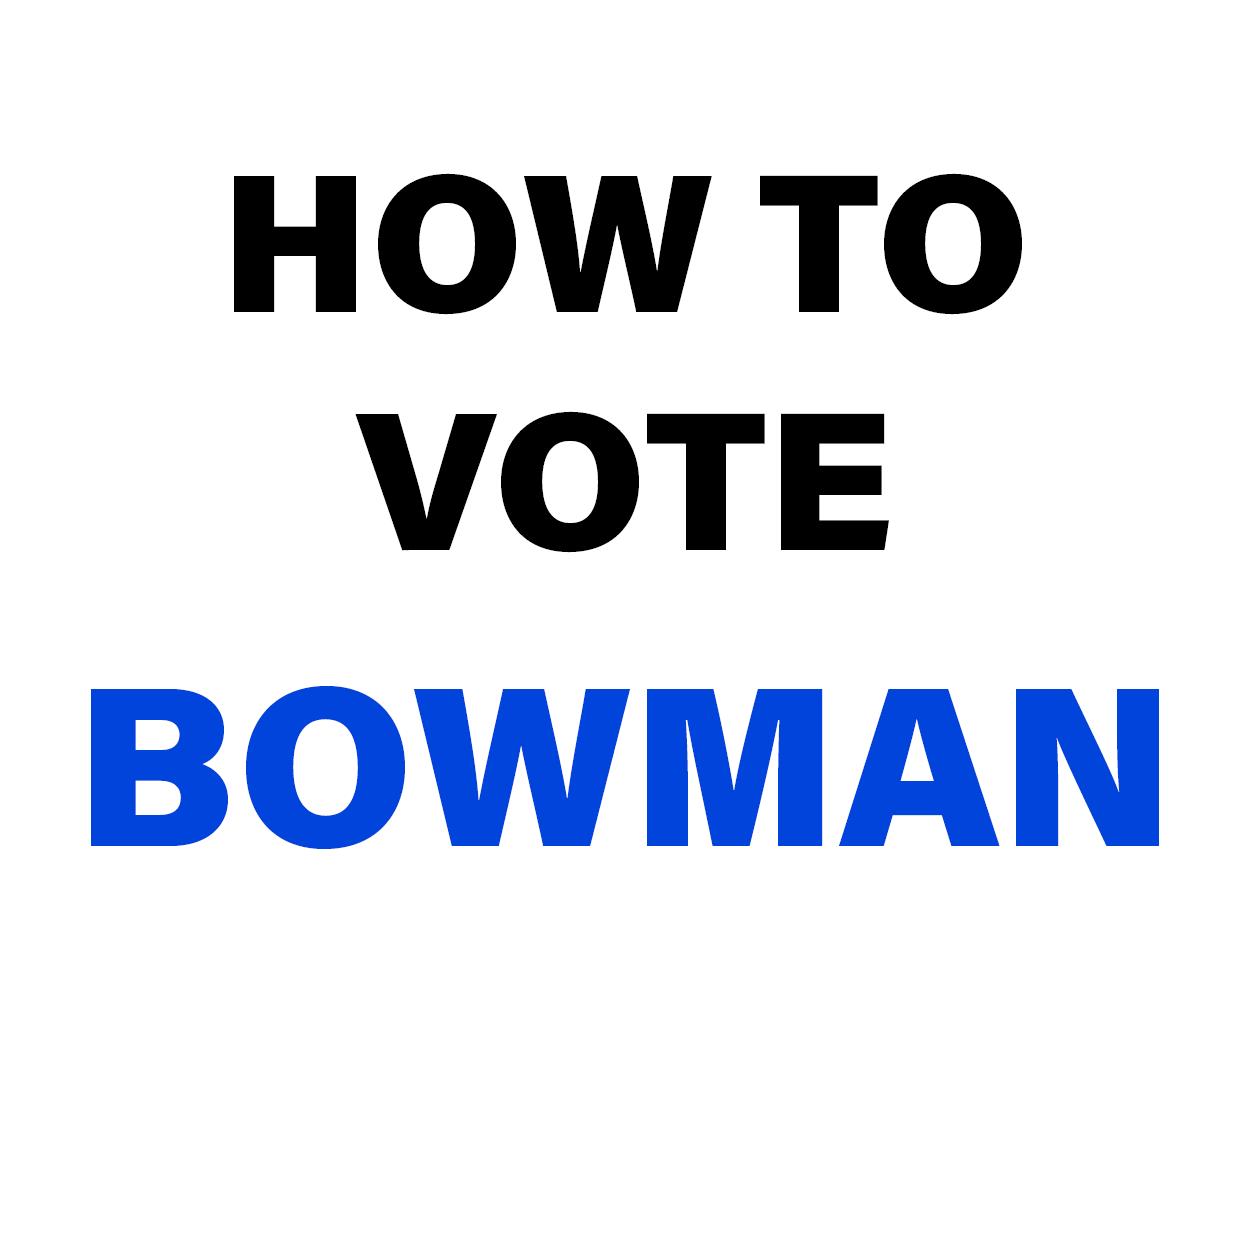 Bowman.png